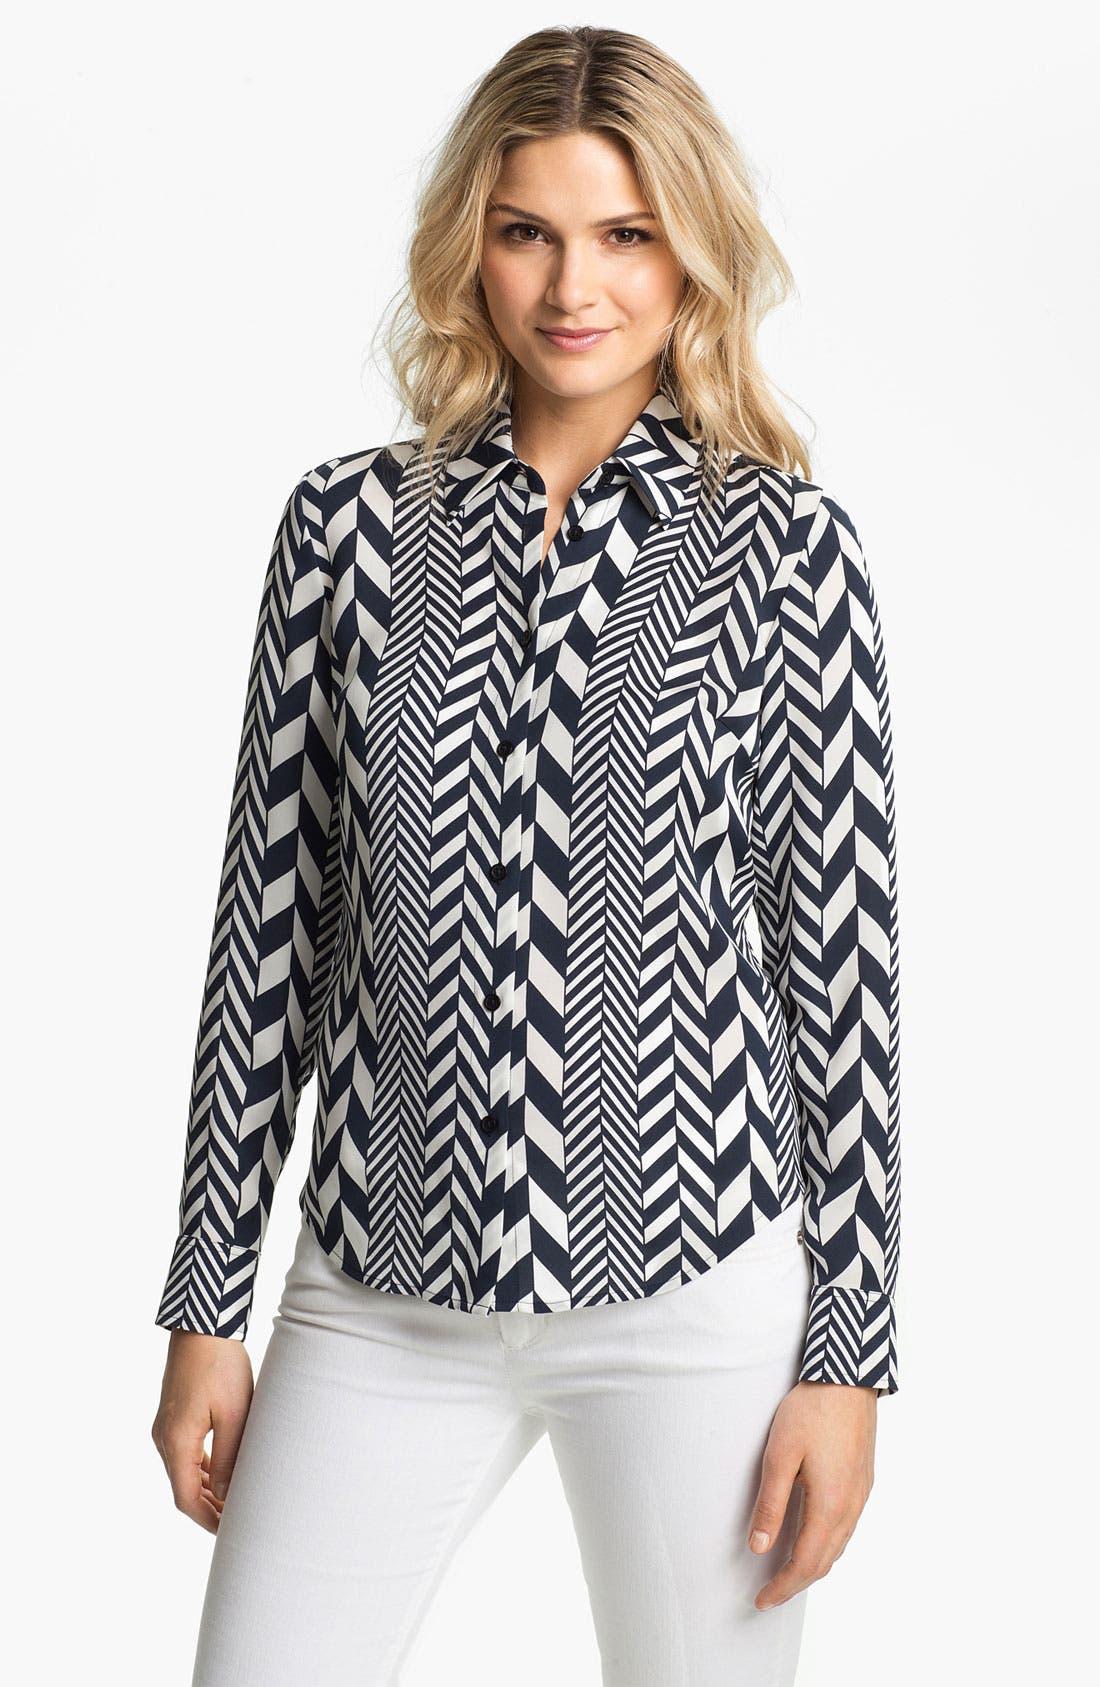 Alternate Image 1 Selected - MICHAEL Michael Kors 'League Stripe' Shirt (Regular & Petite)